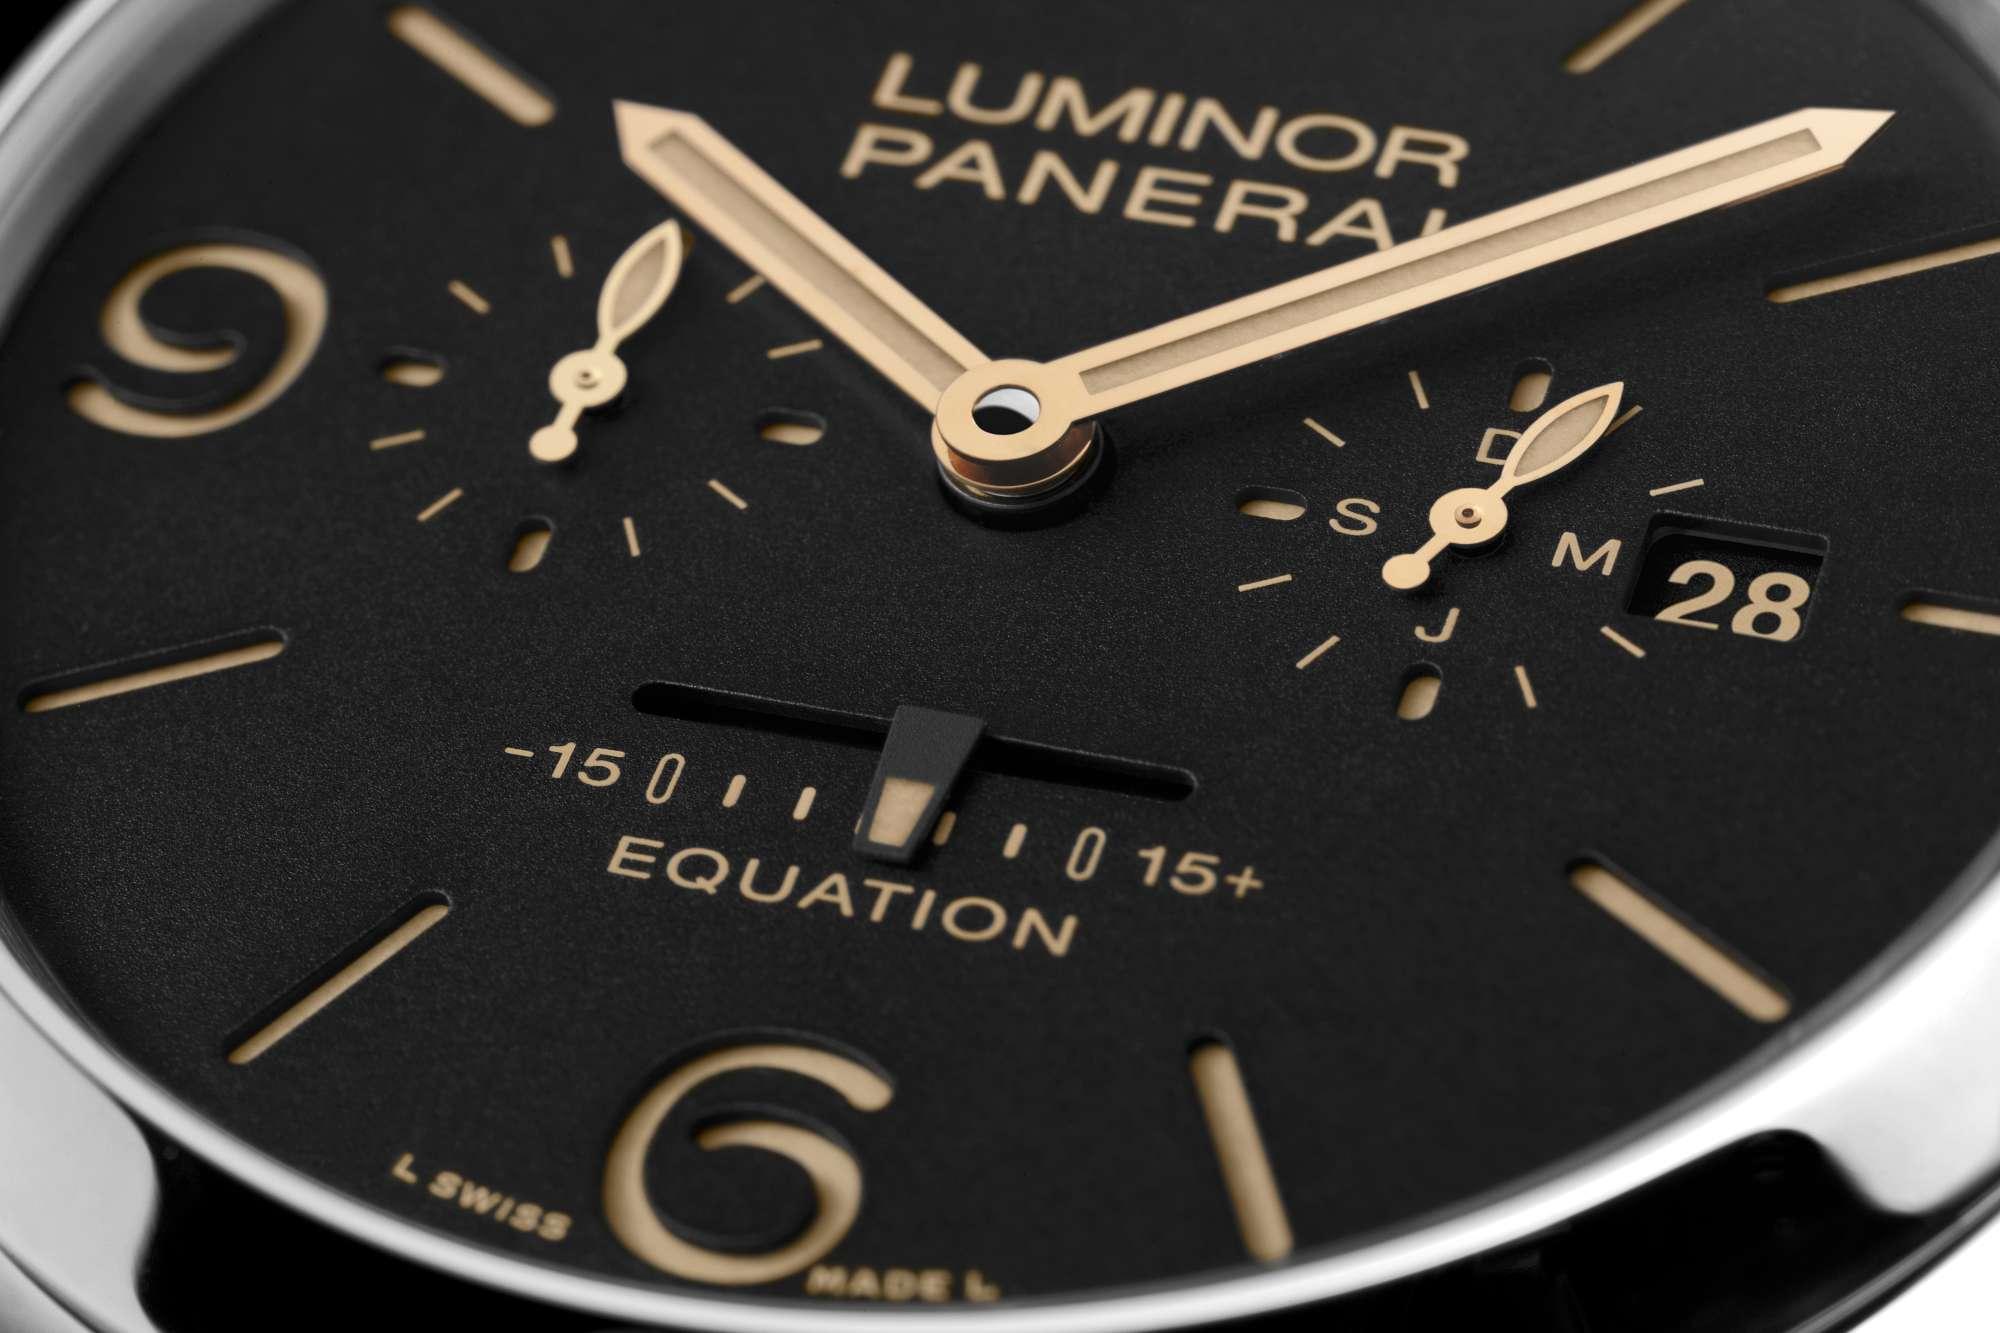 Luminor 1950 Equation of Time 8 Days